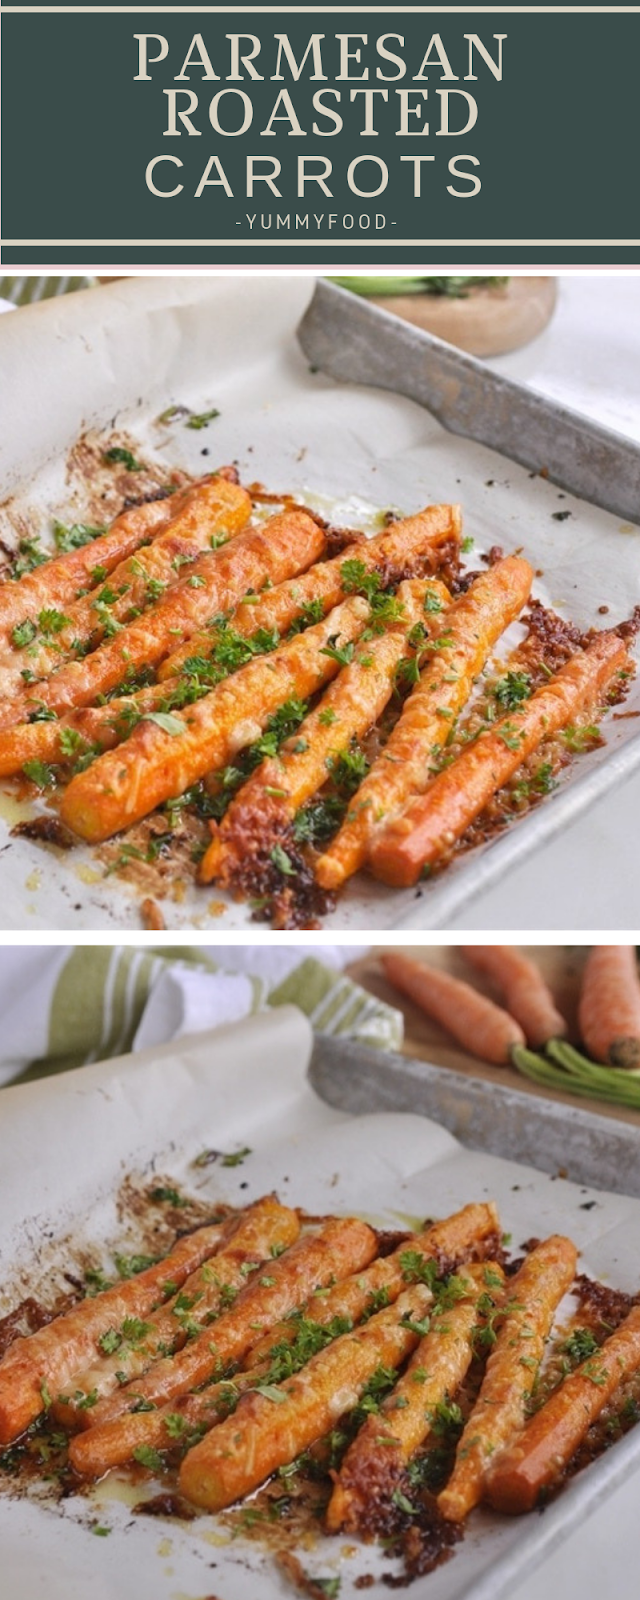 Pаrmеѕаn Rоаѕtеd Carrots